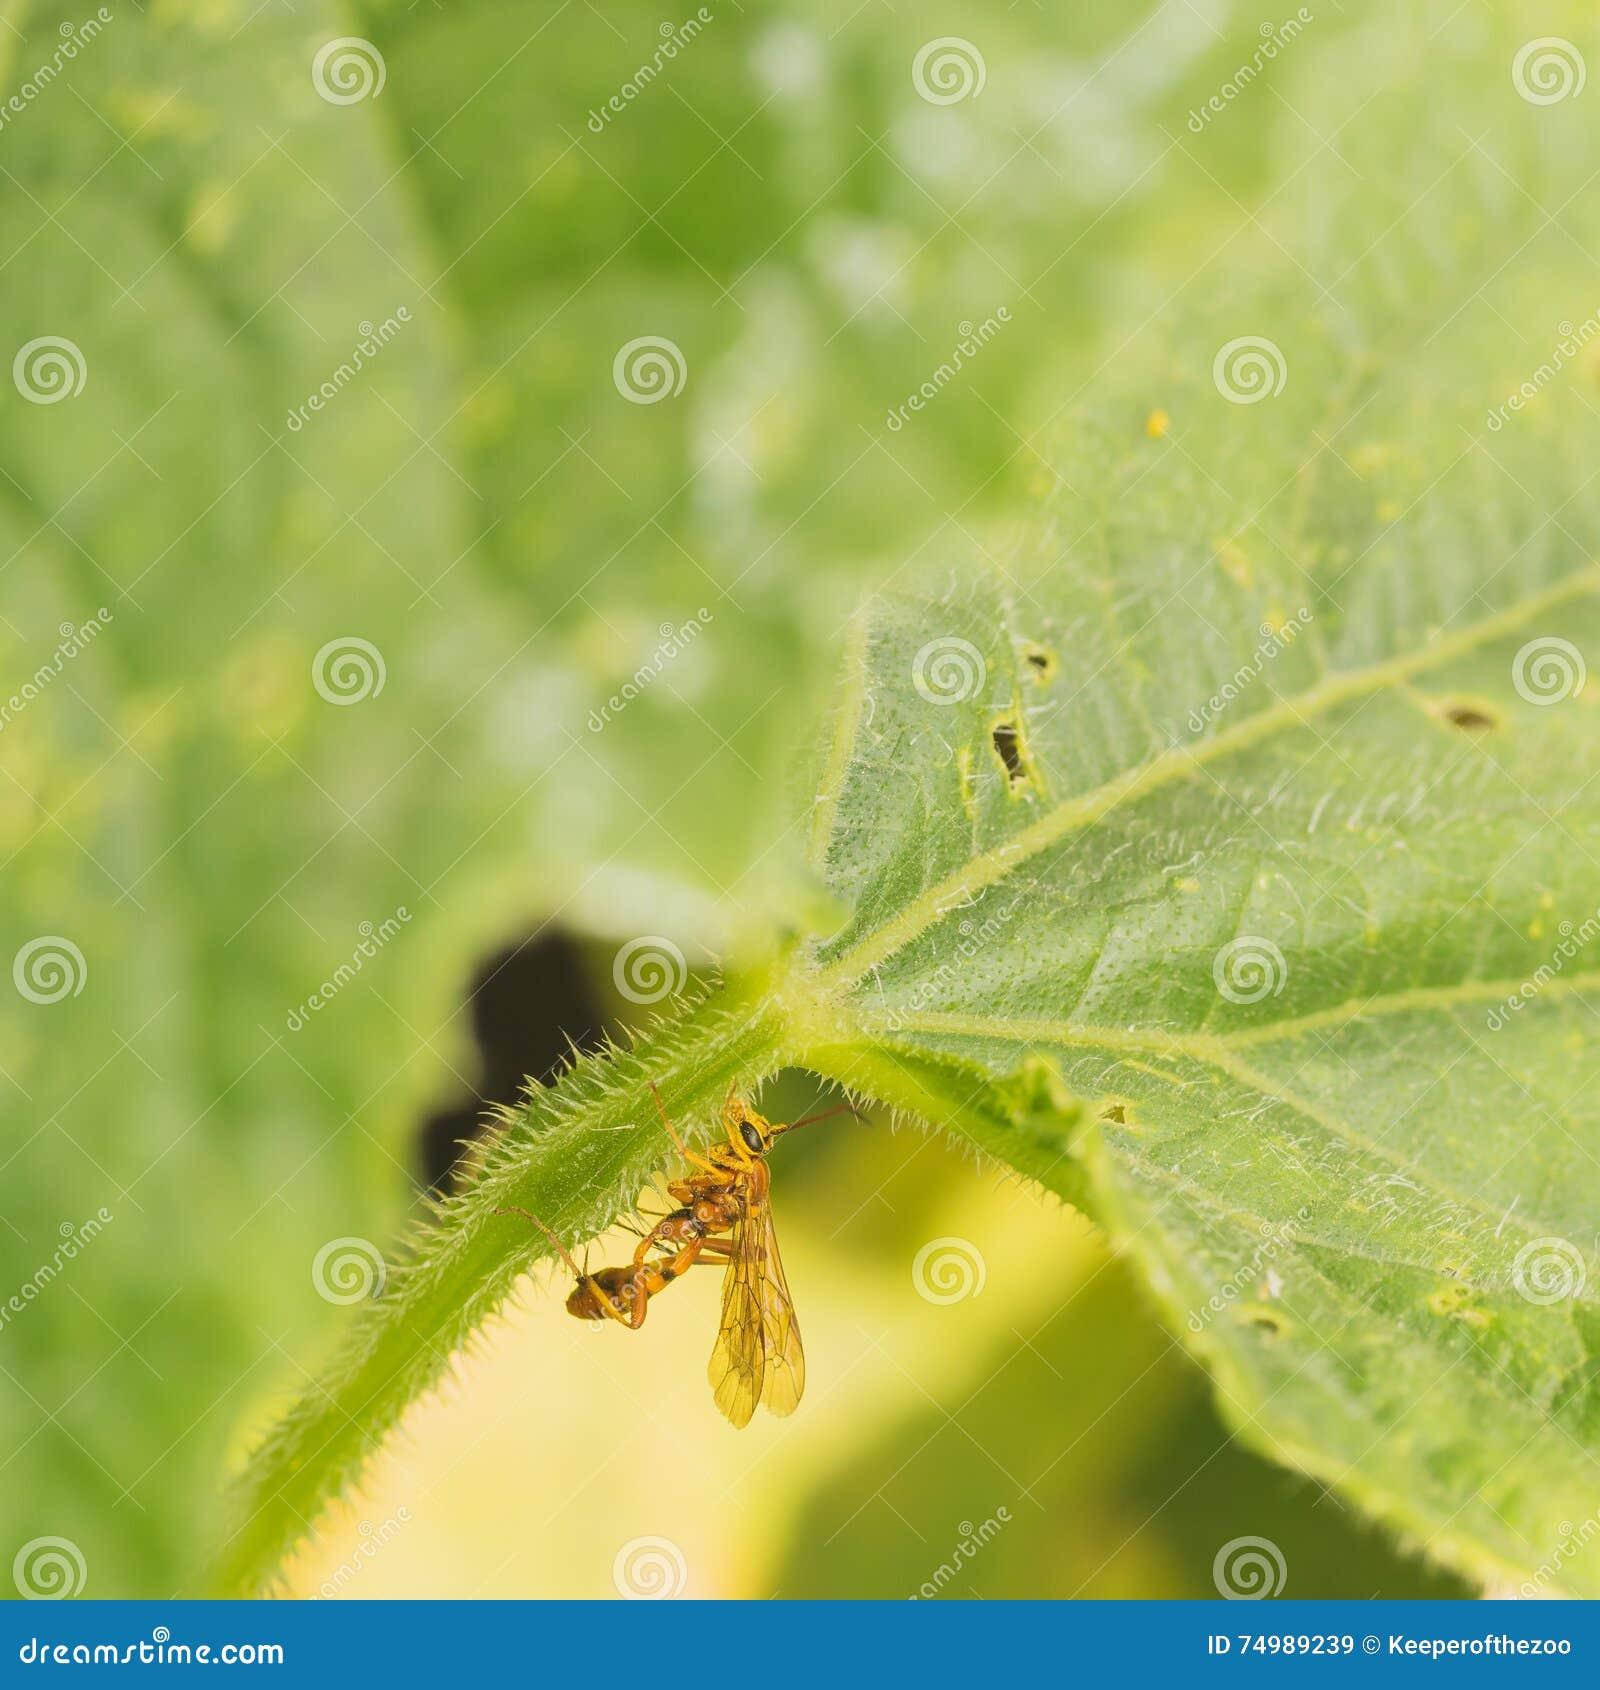 Ichneomon Wasp on Leaf Stem